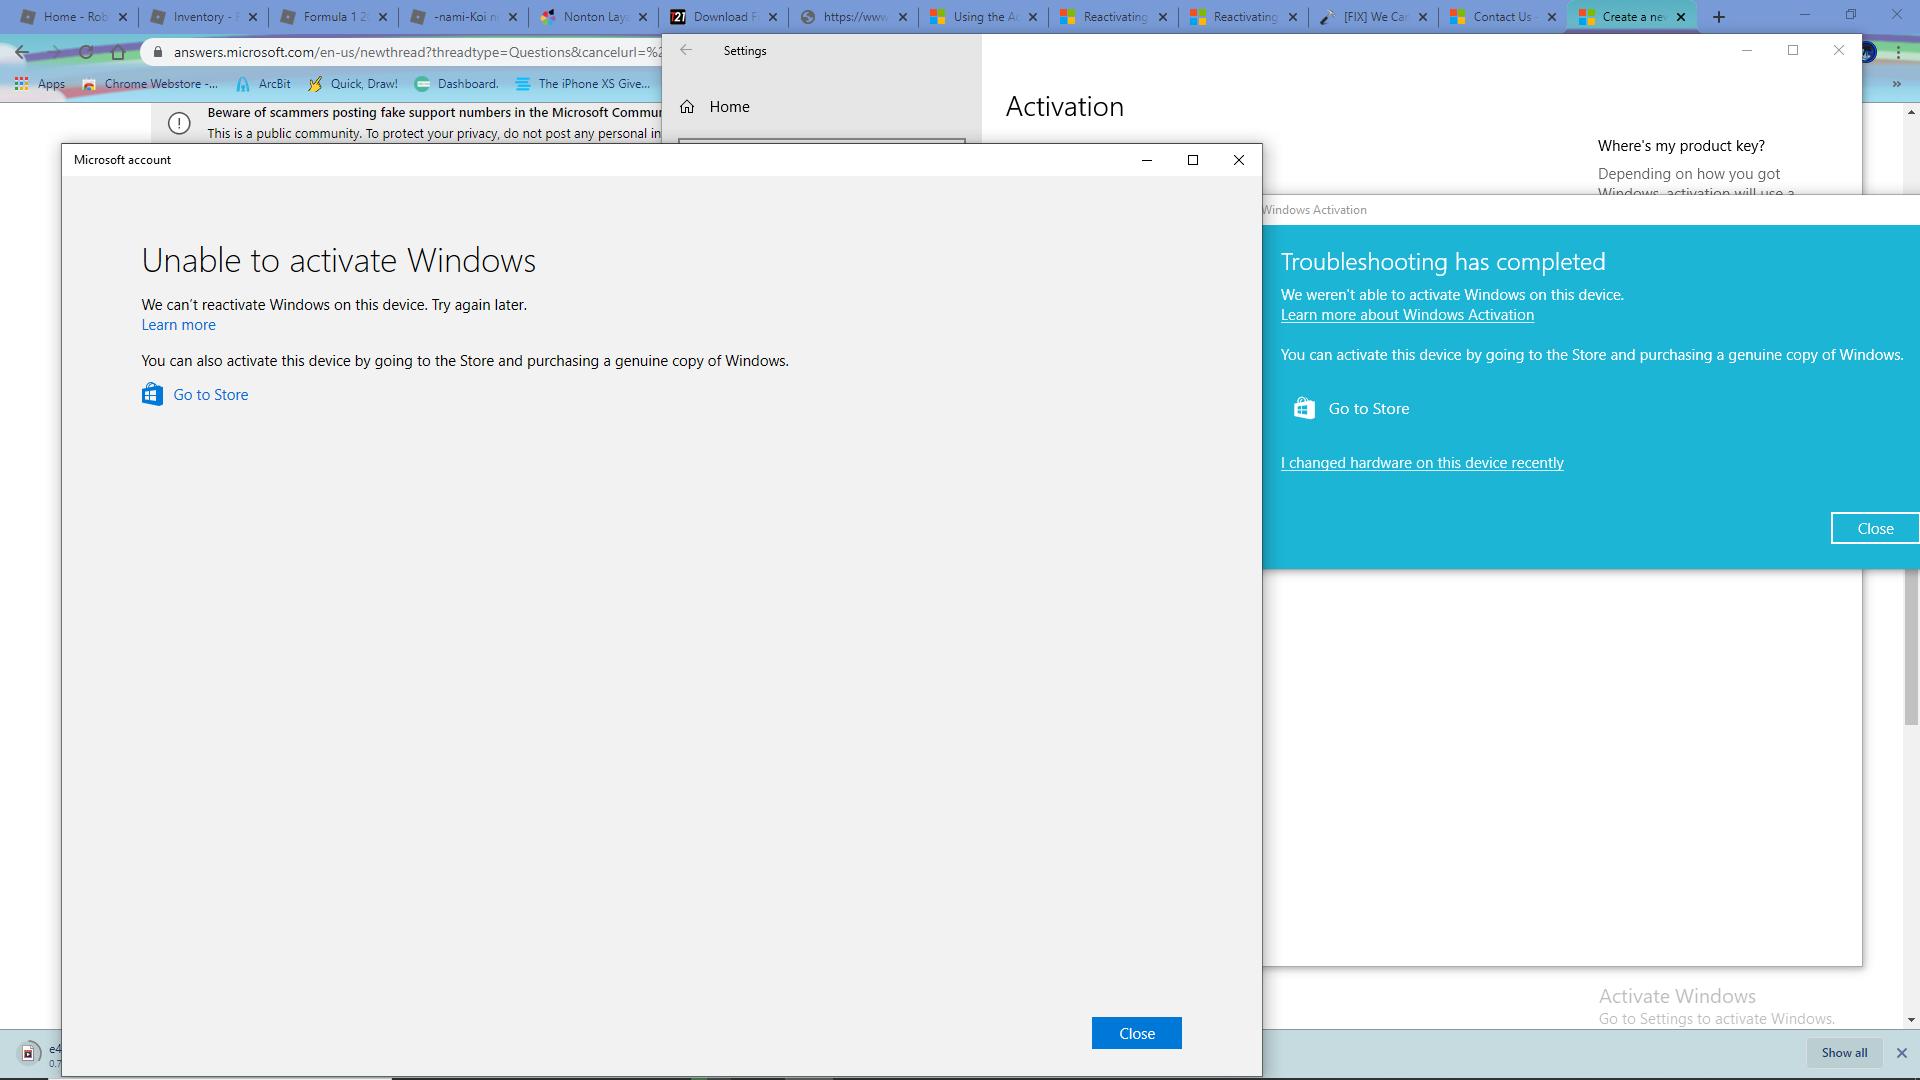 Reactivating windows after a hardware change 31cef27e-e04d-4a92-9427-76f02ff2d03a?upload=true.png